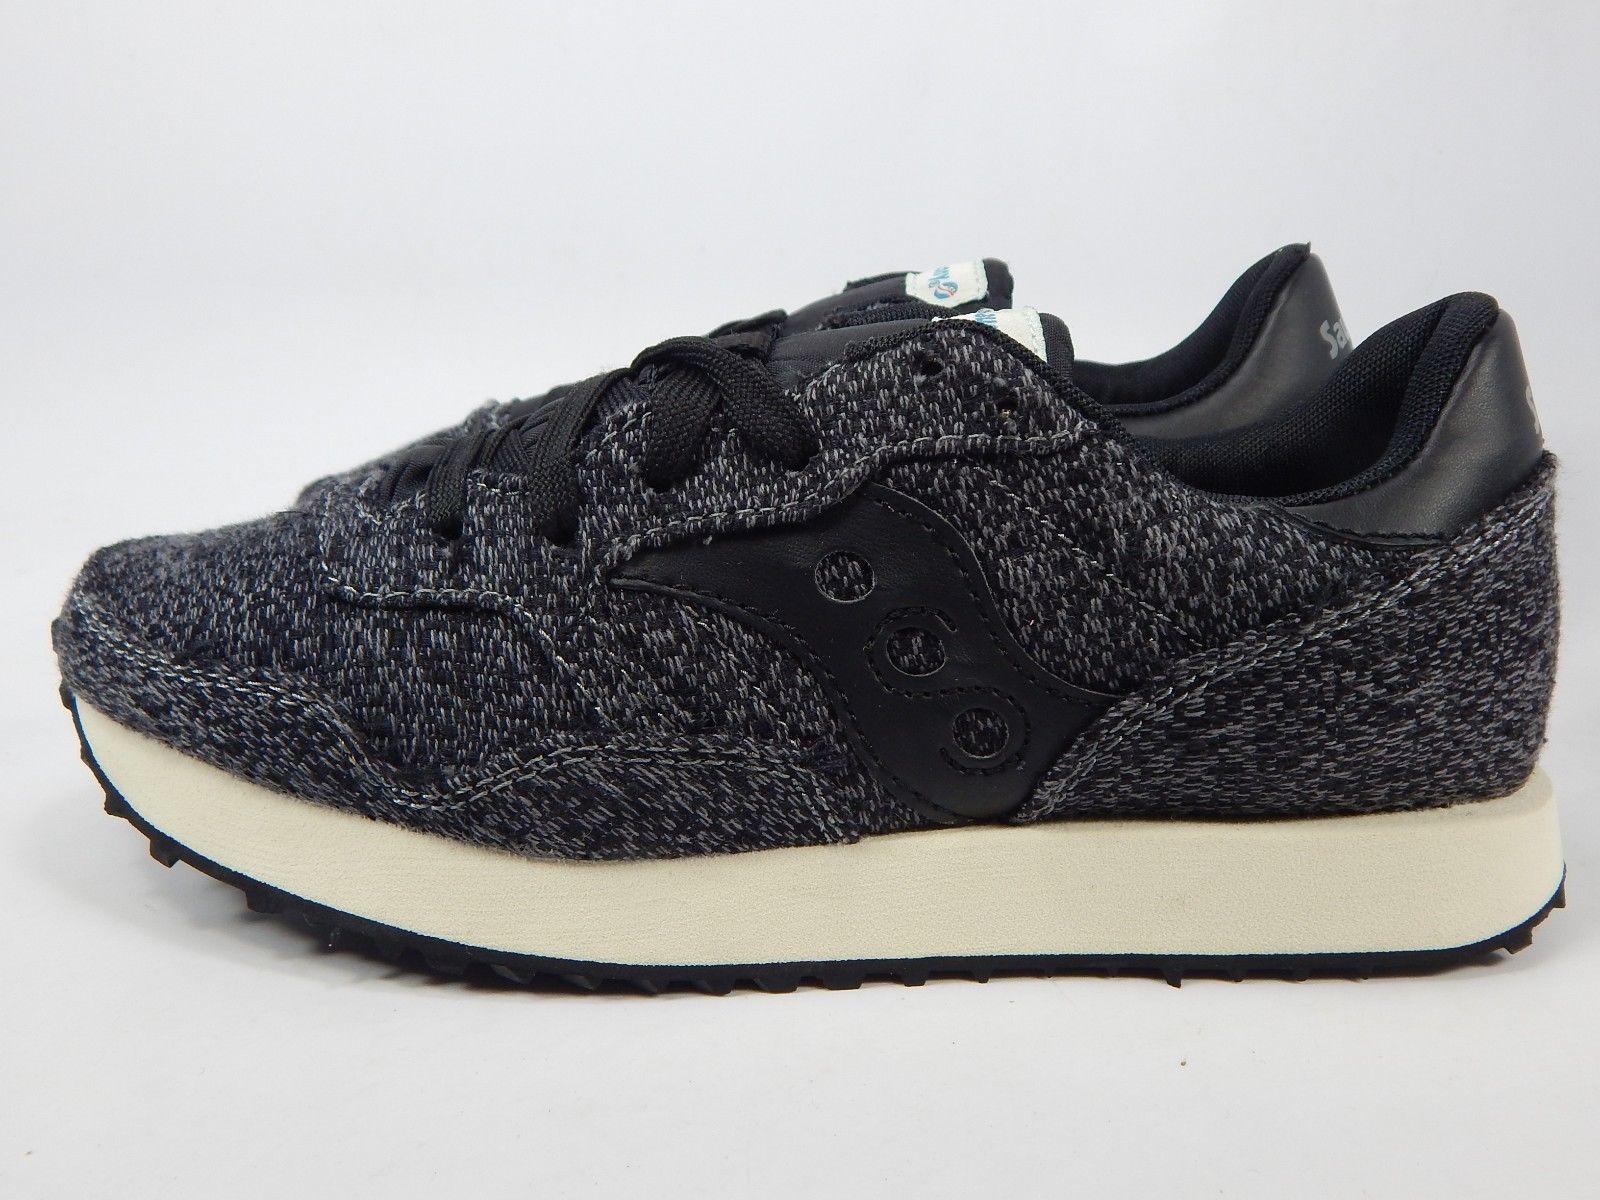 Saucony DXN Trainer CL Original S60359-1 Womens Running Shoes Size 7 M (B) EU 38